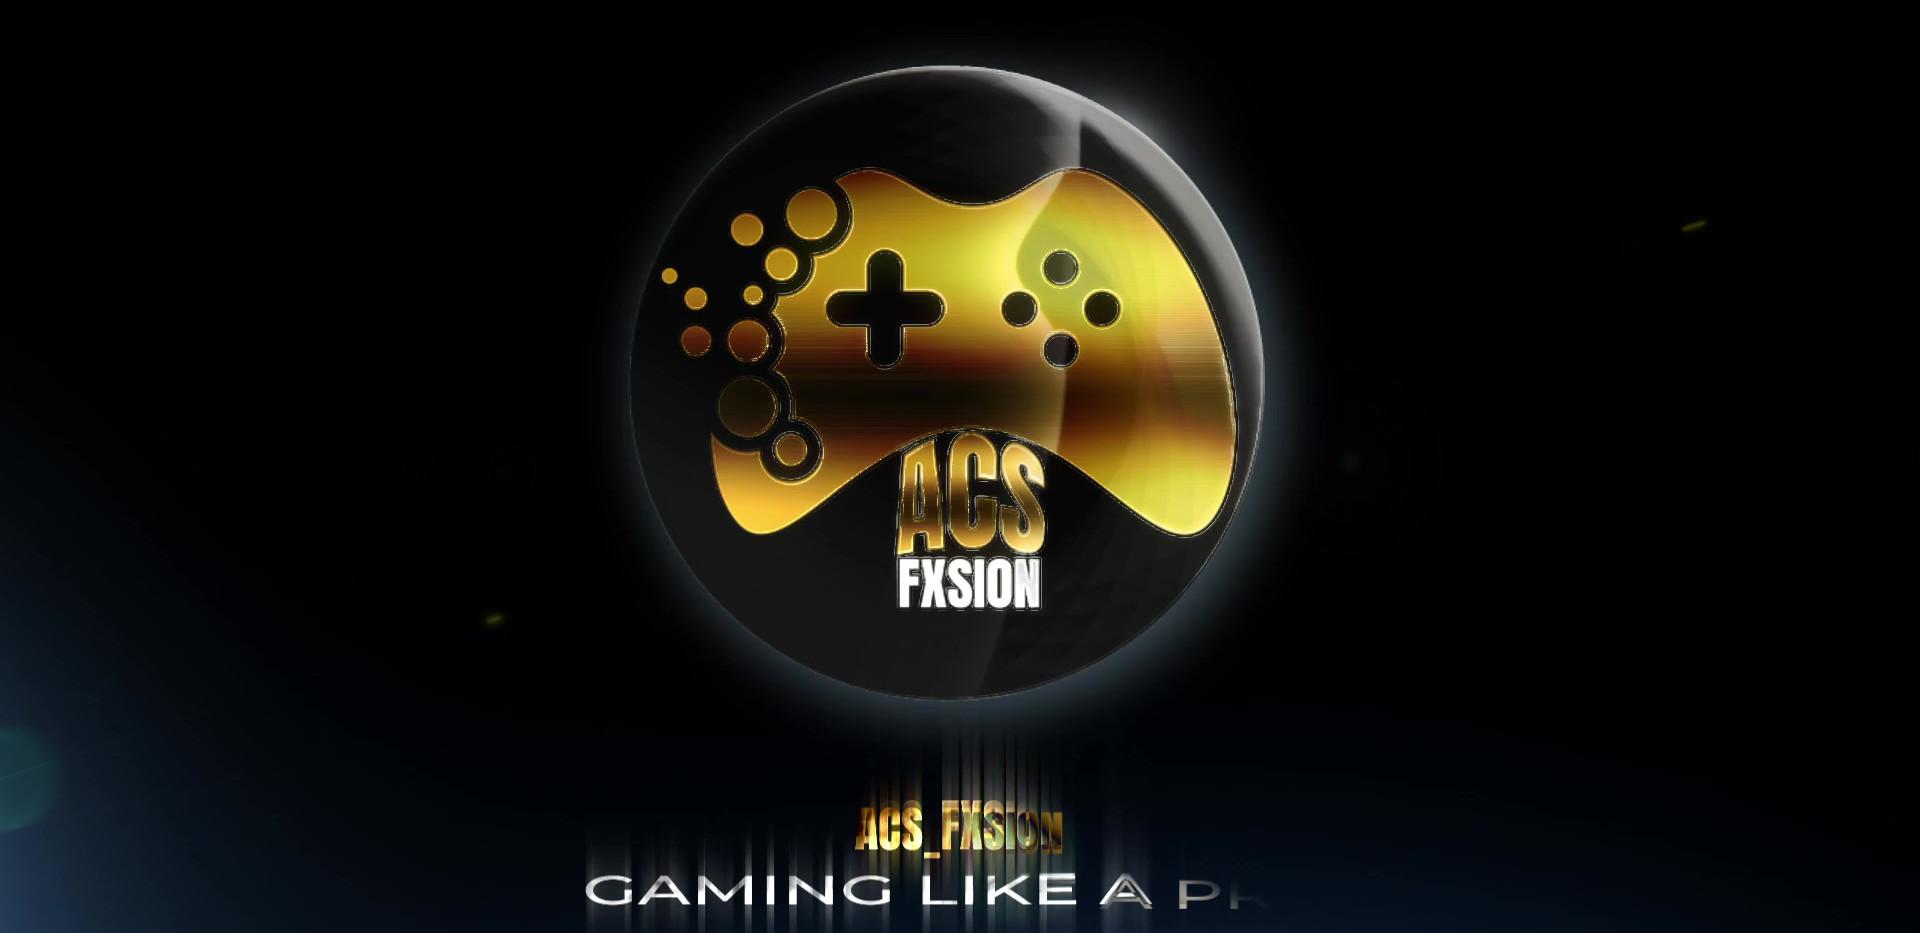 ACS_FXSION Transformer.mp4